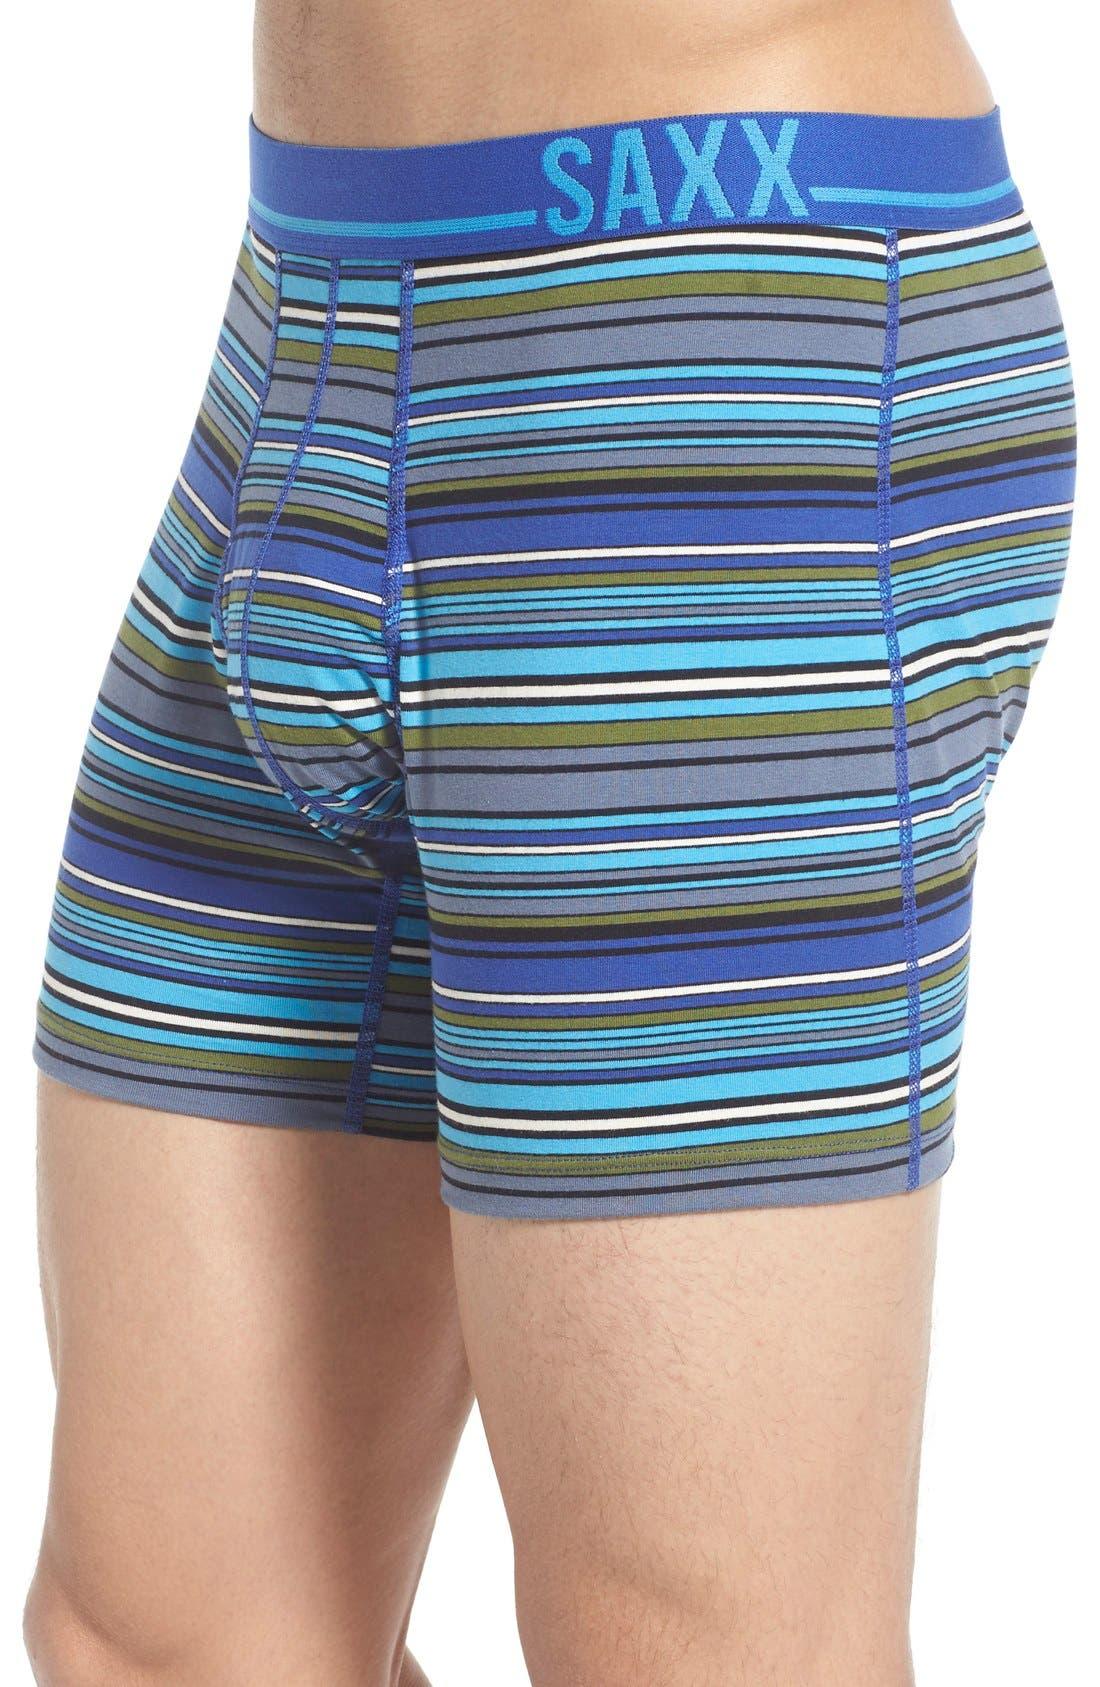 365 Boxer Briefs,                             Alternate thumbnail 4, color,                             Cobalt Blanket Stripe